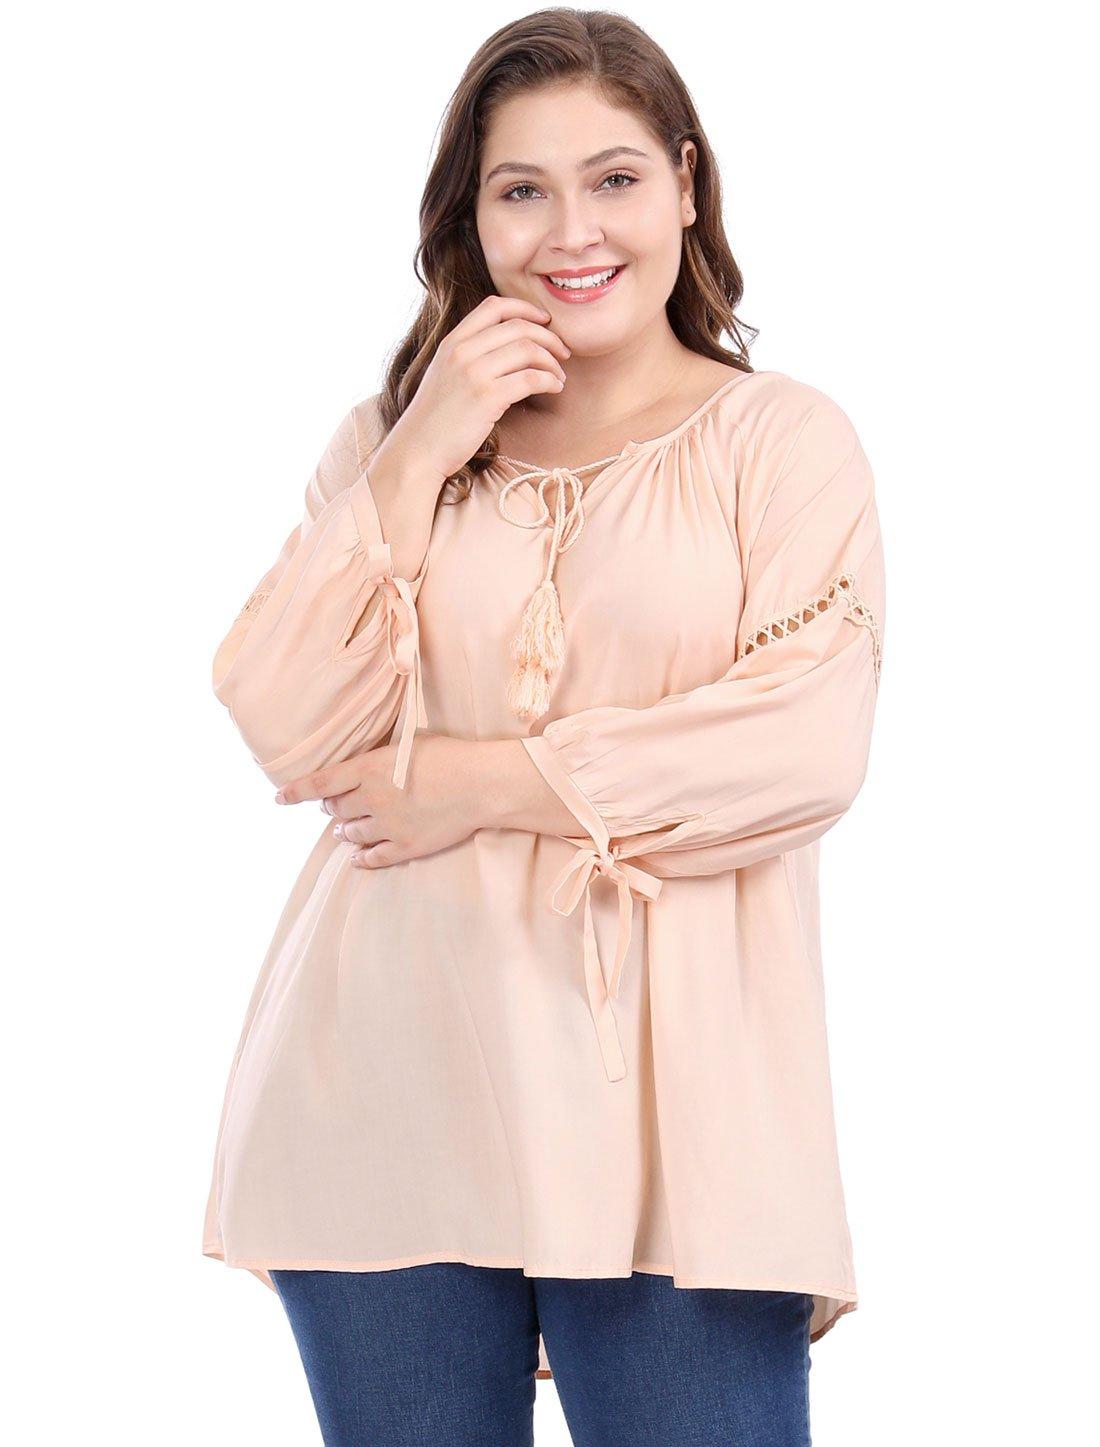 Agnes Orinda Women's Plus Size Raglan Sleeves Hollow Out Tie Neck Tunic Top